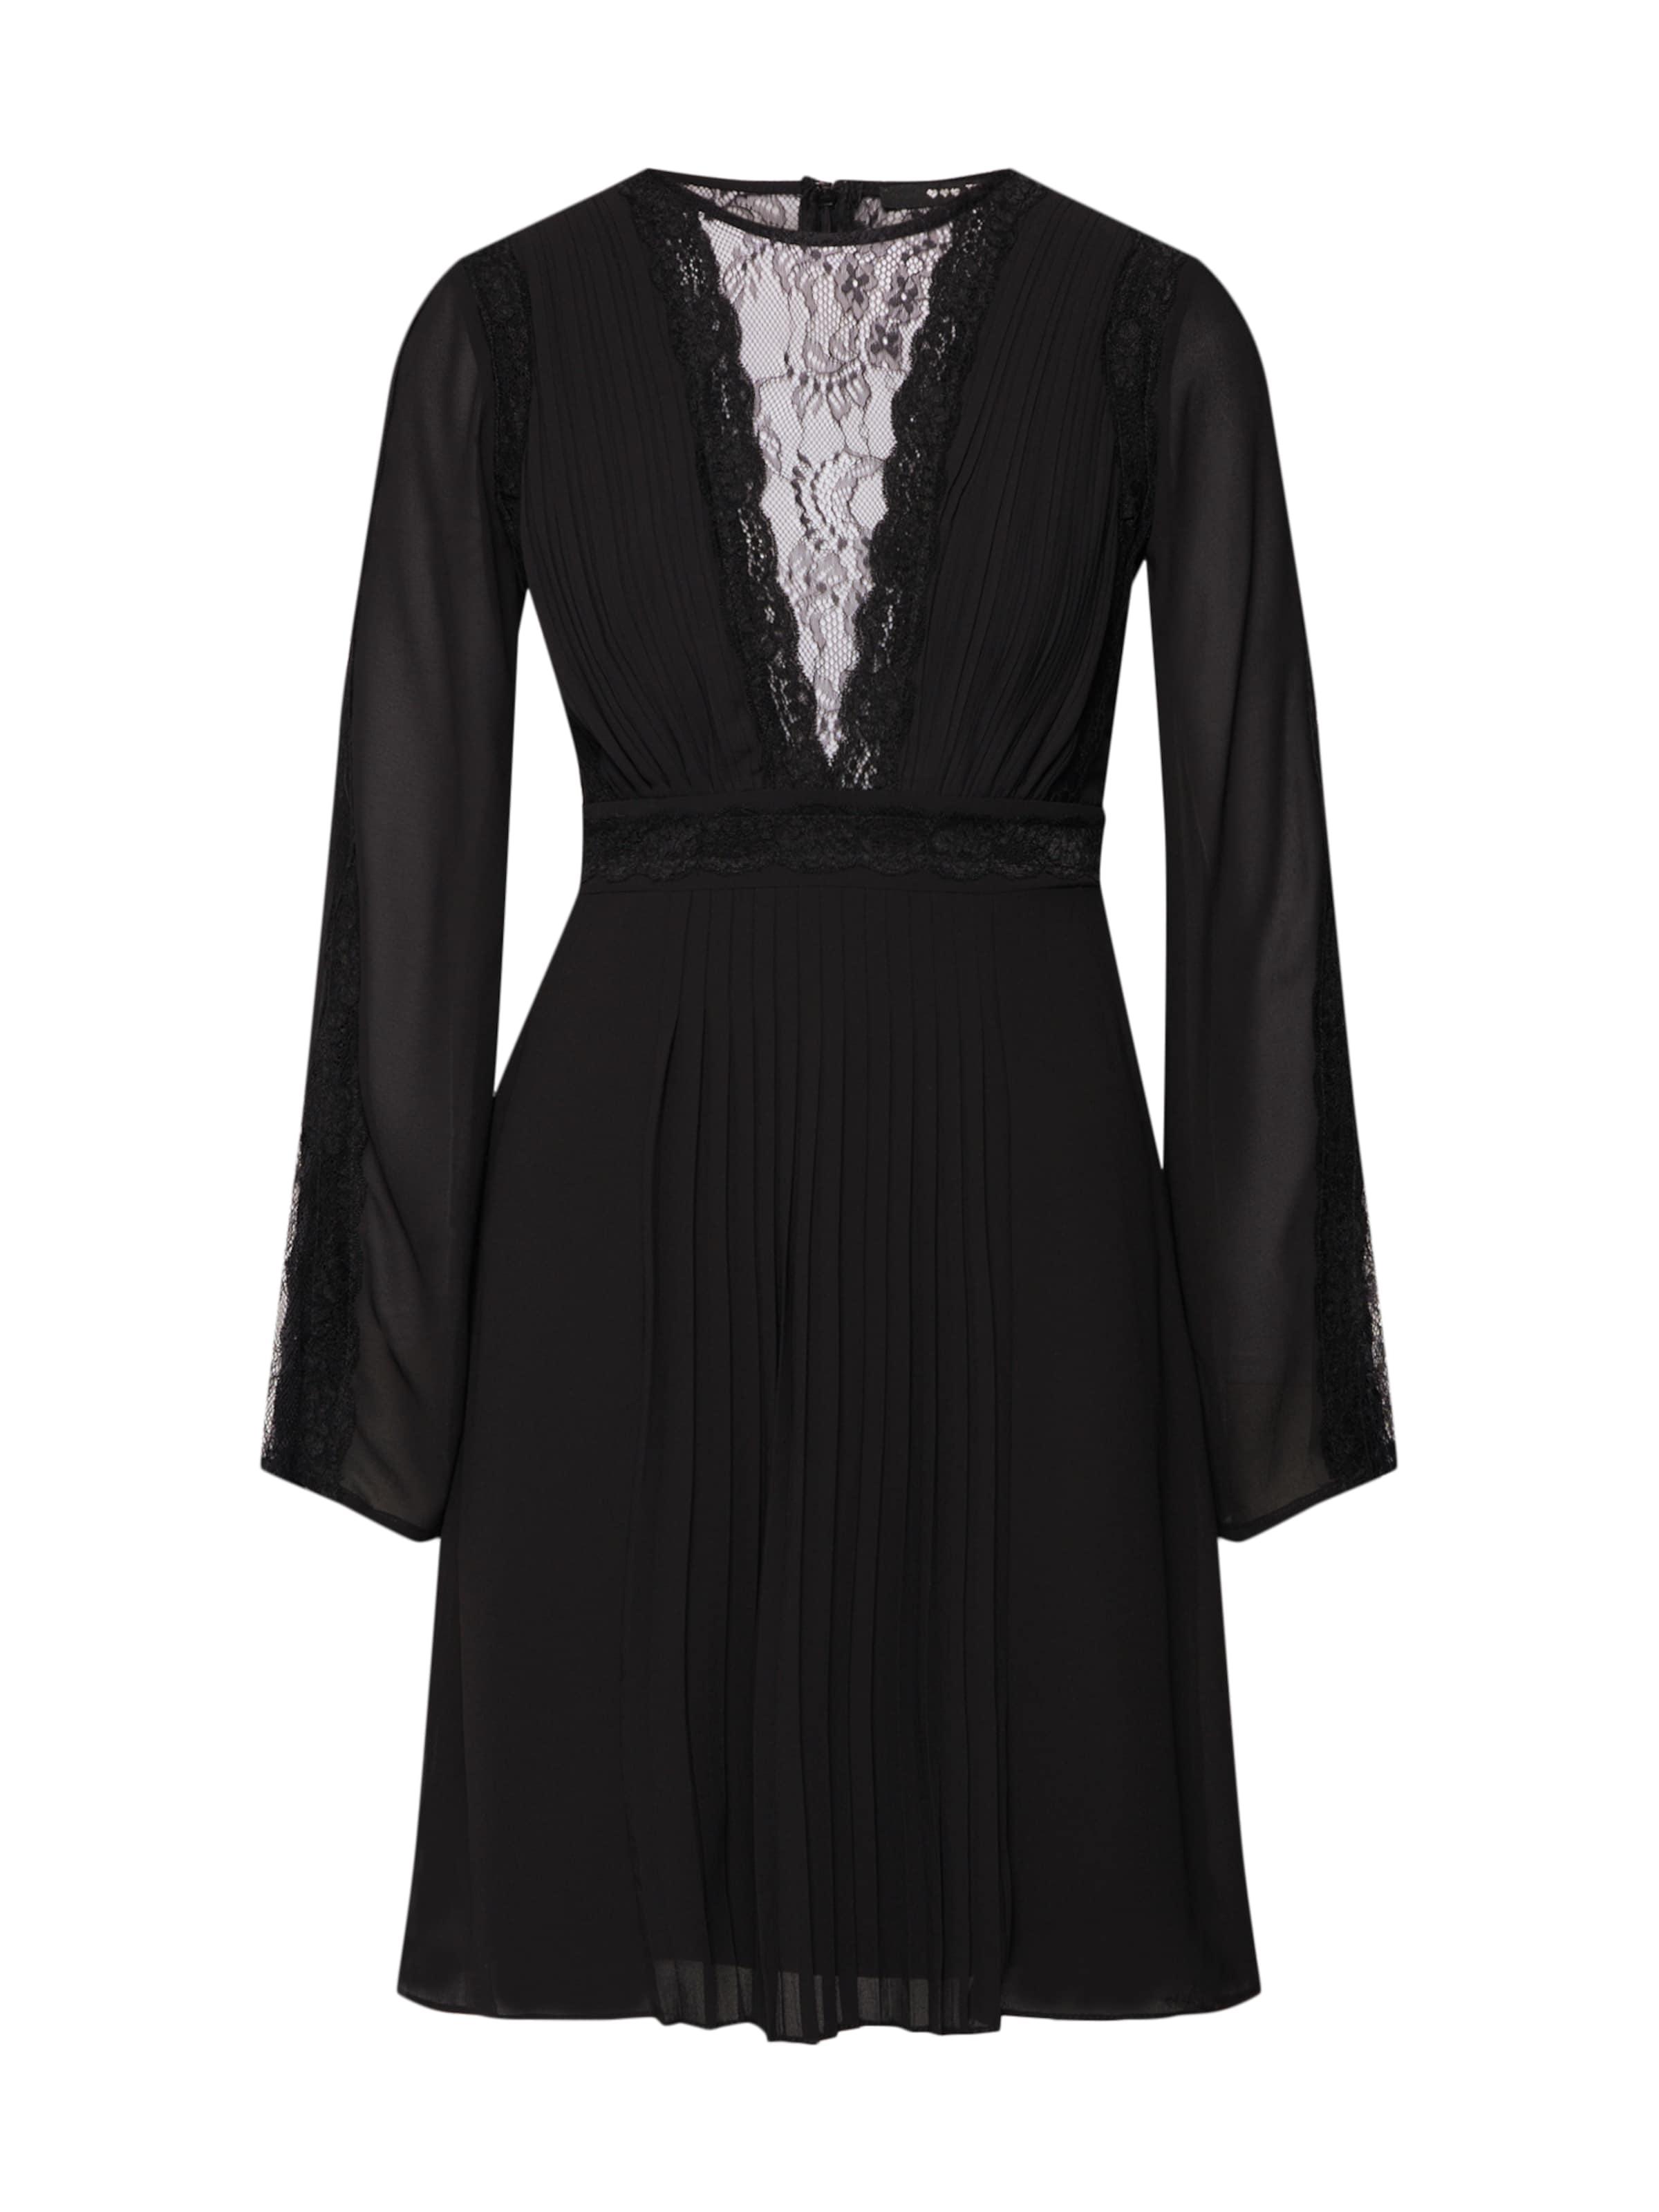 Robe Noir Tfnc En Tfnc Robe OwPn0kX8